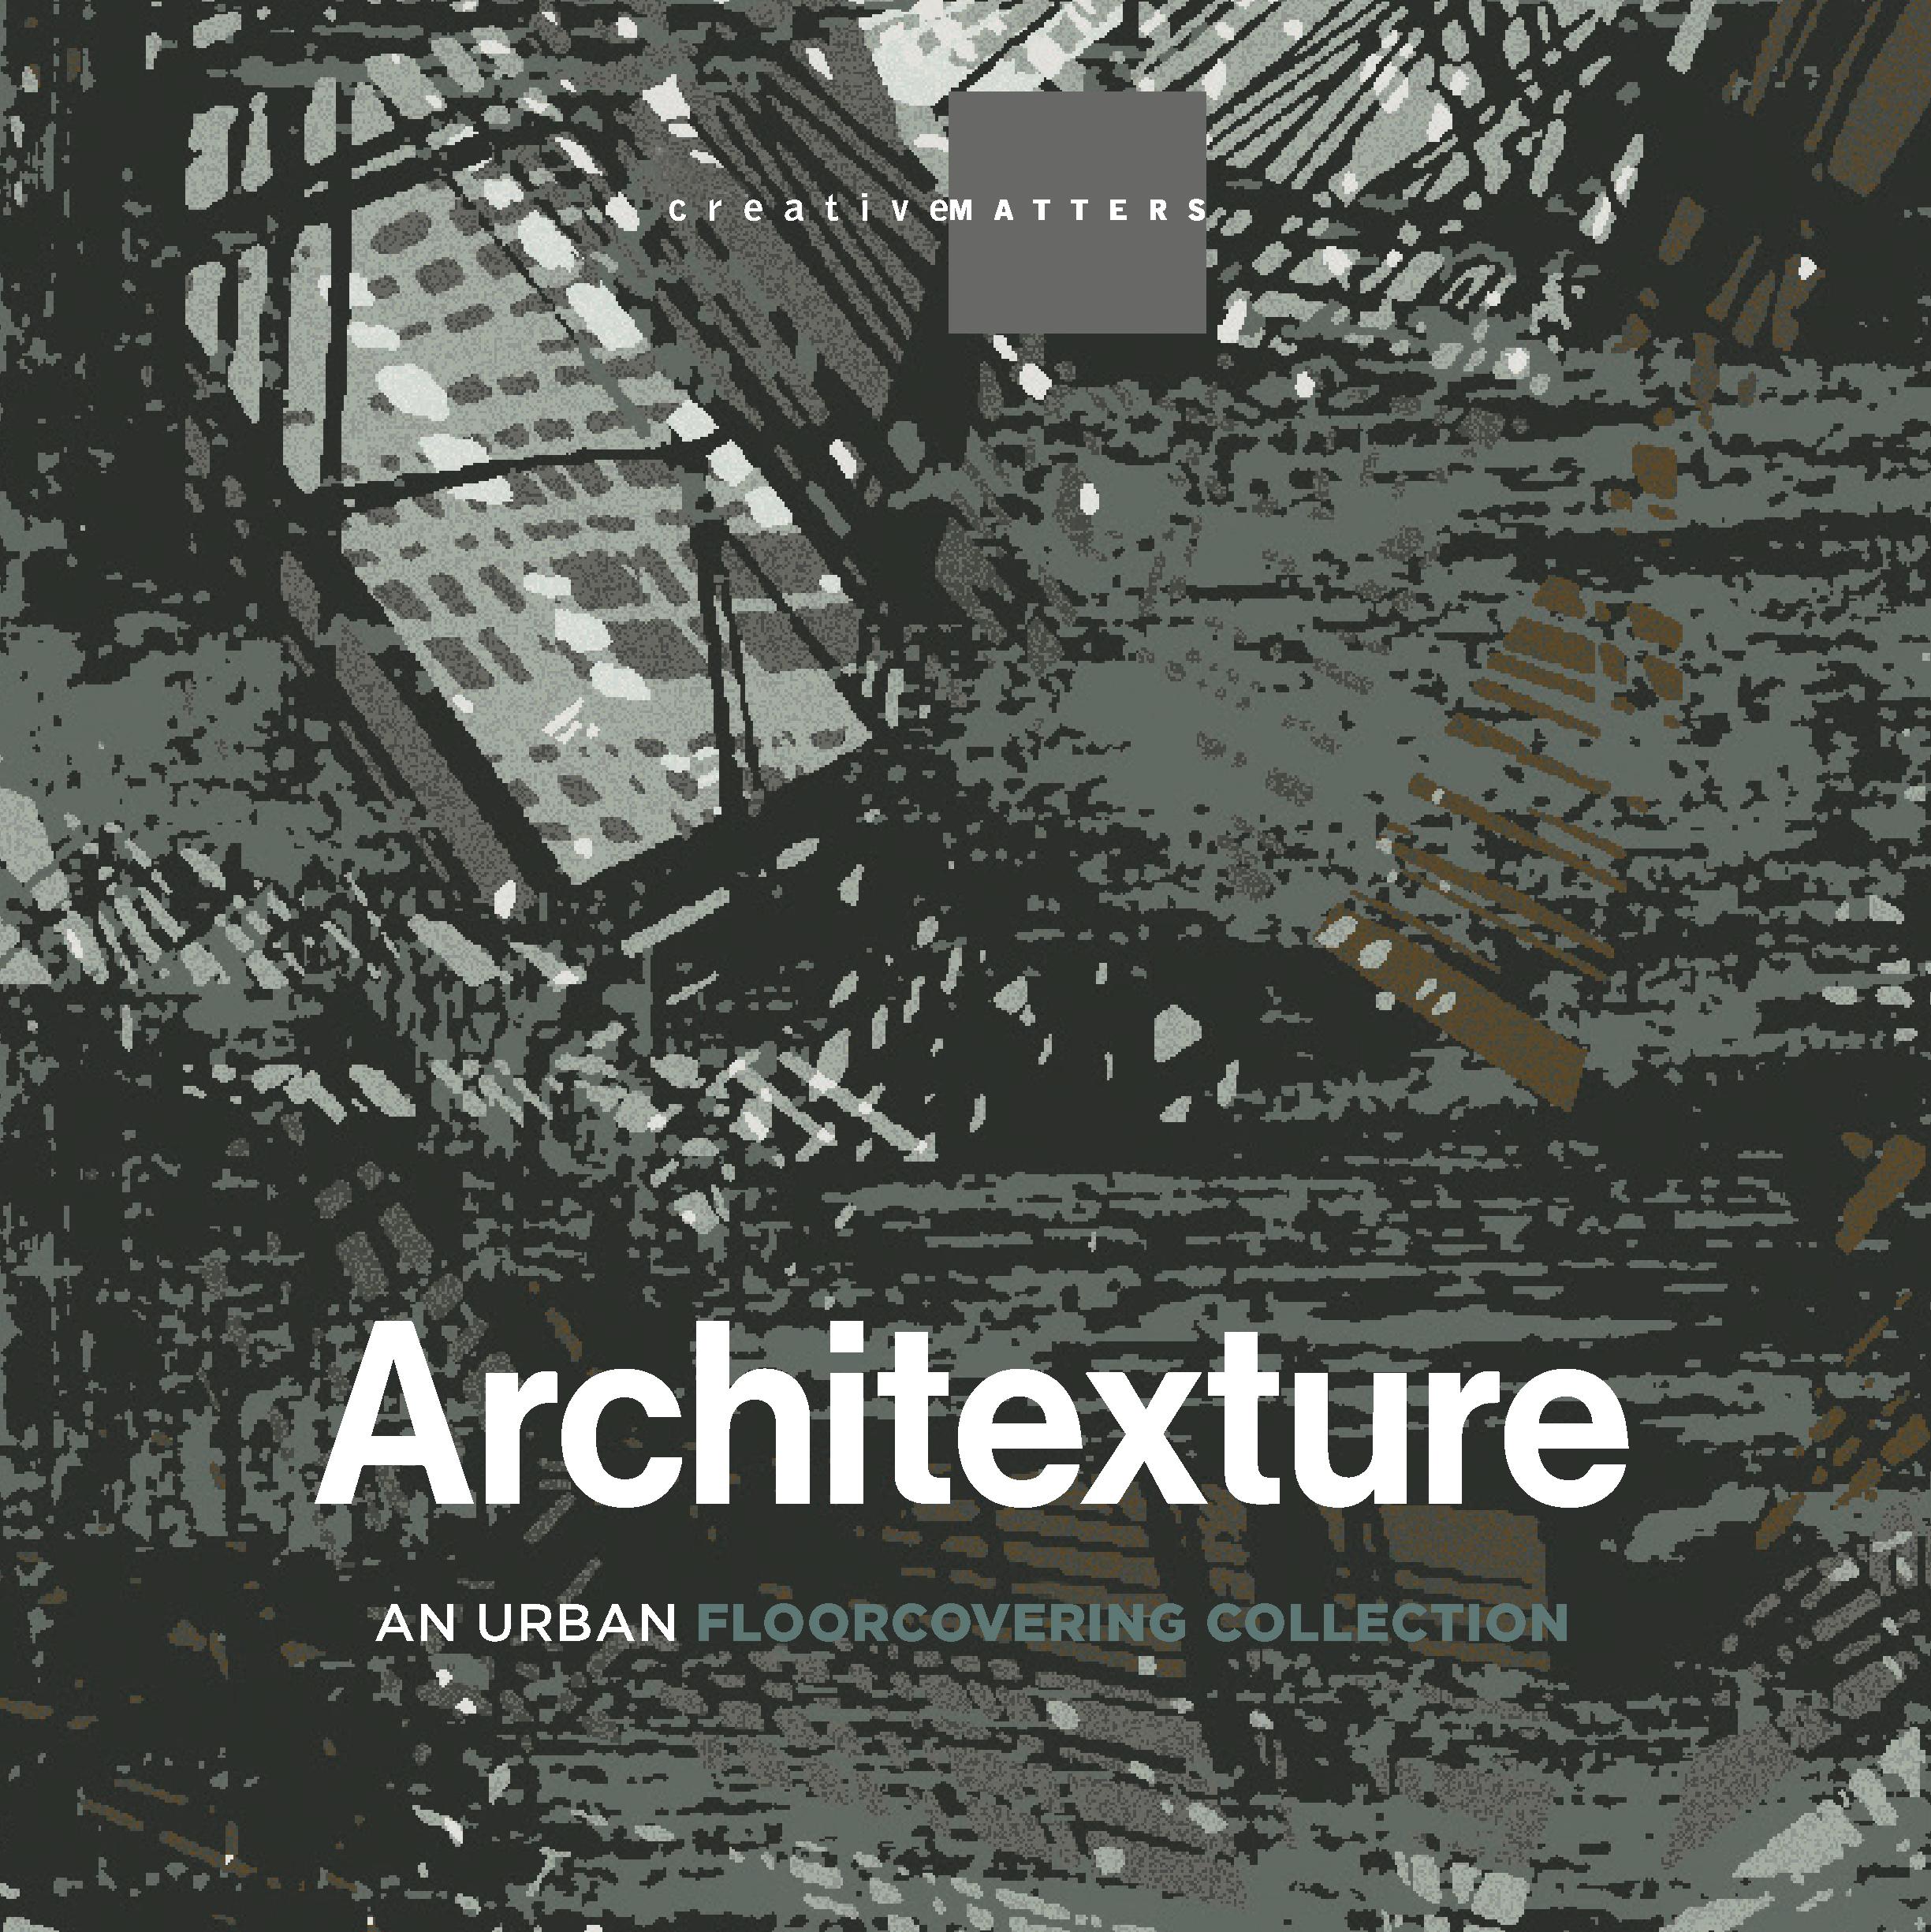 Architexture_Cover.jpg